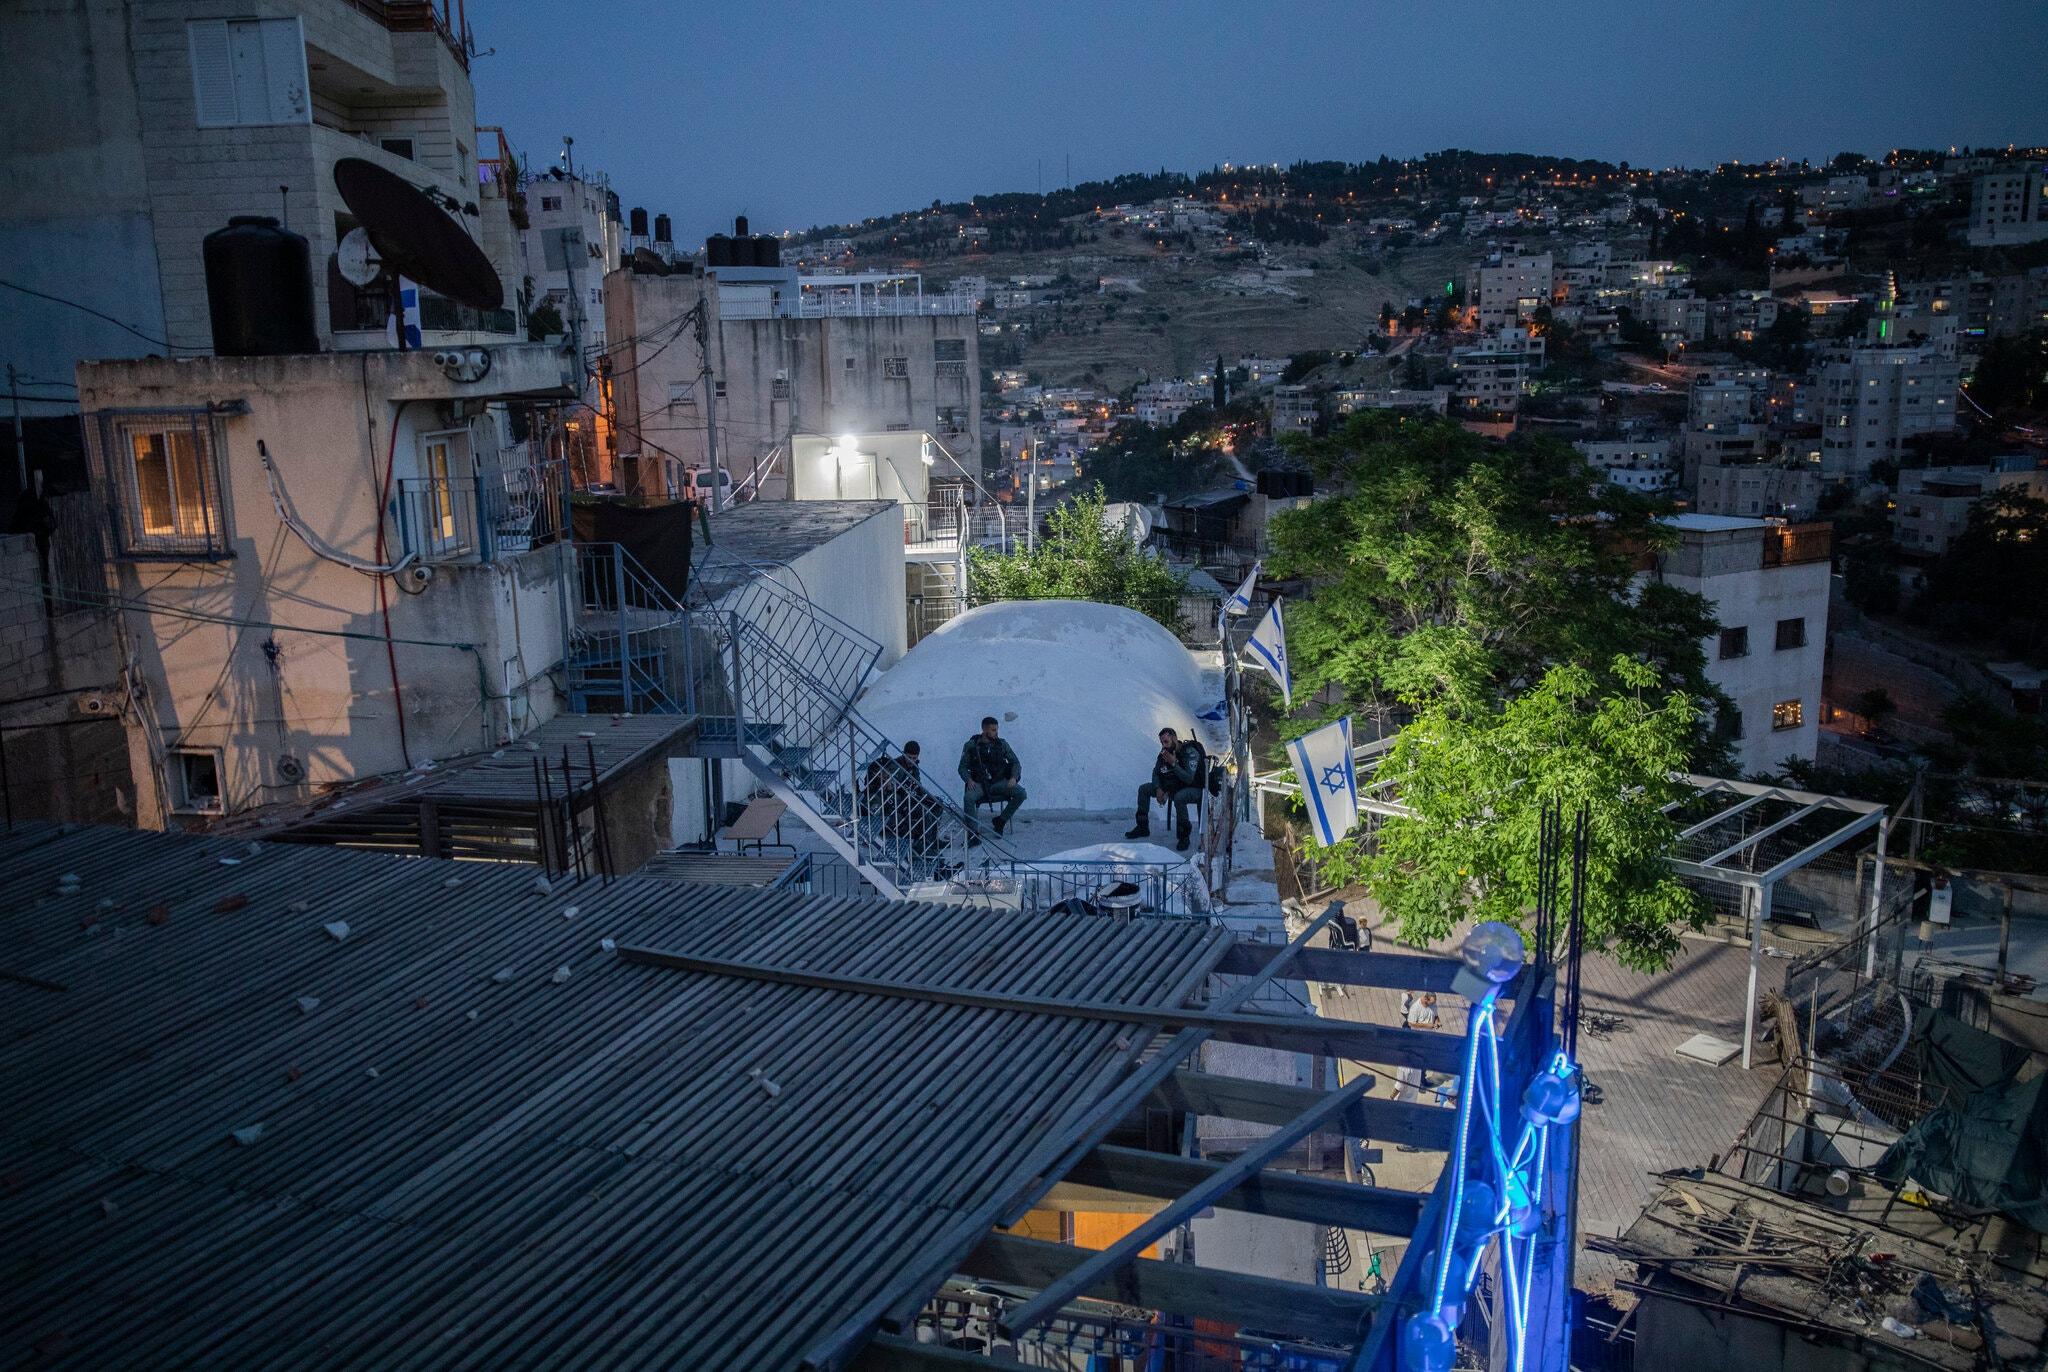 پلیس اسرائیل در بالکن خانه فلسطینیان